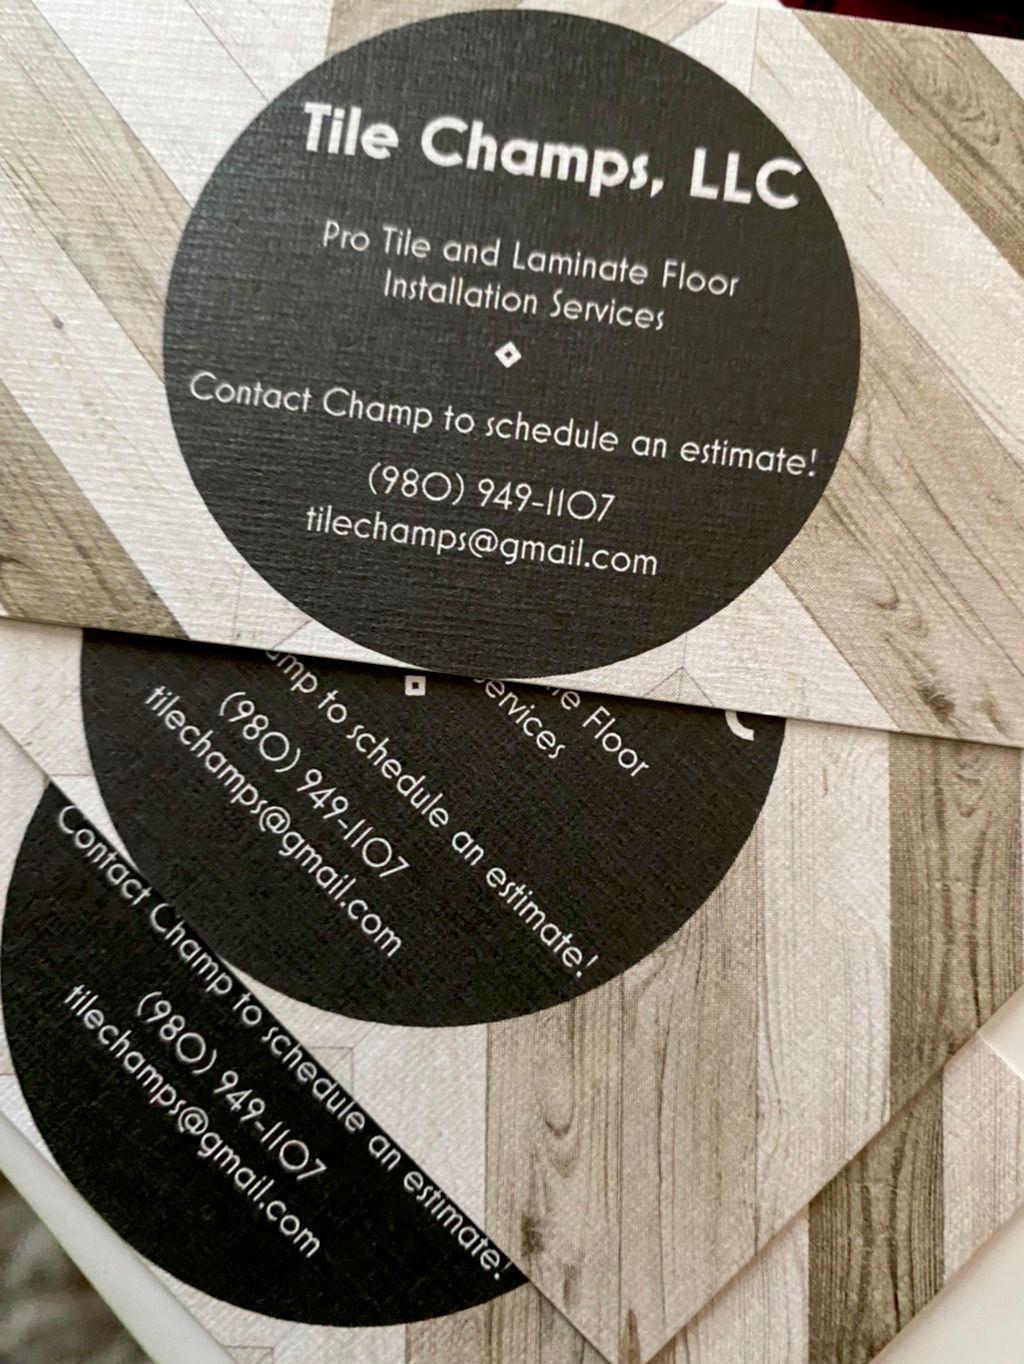 Tile Champs LLC